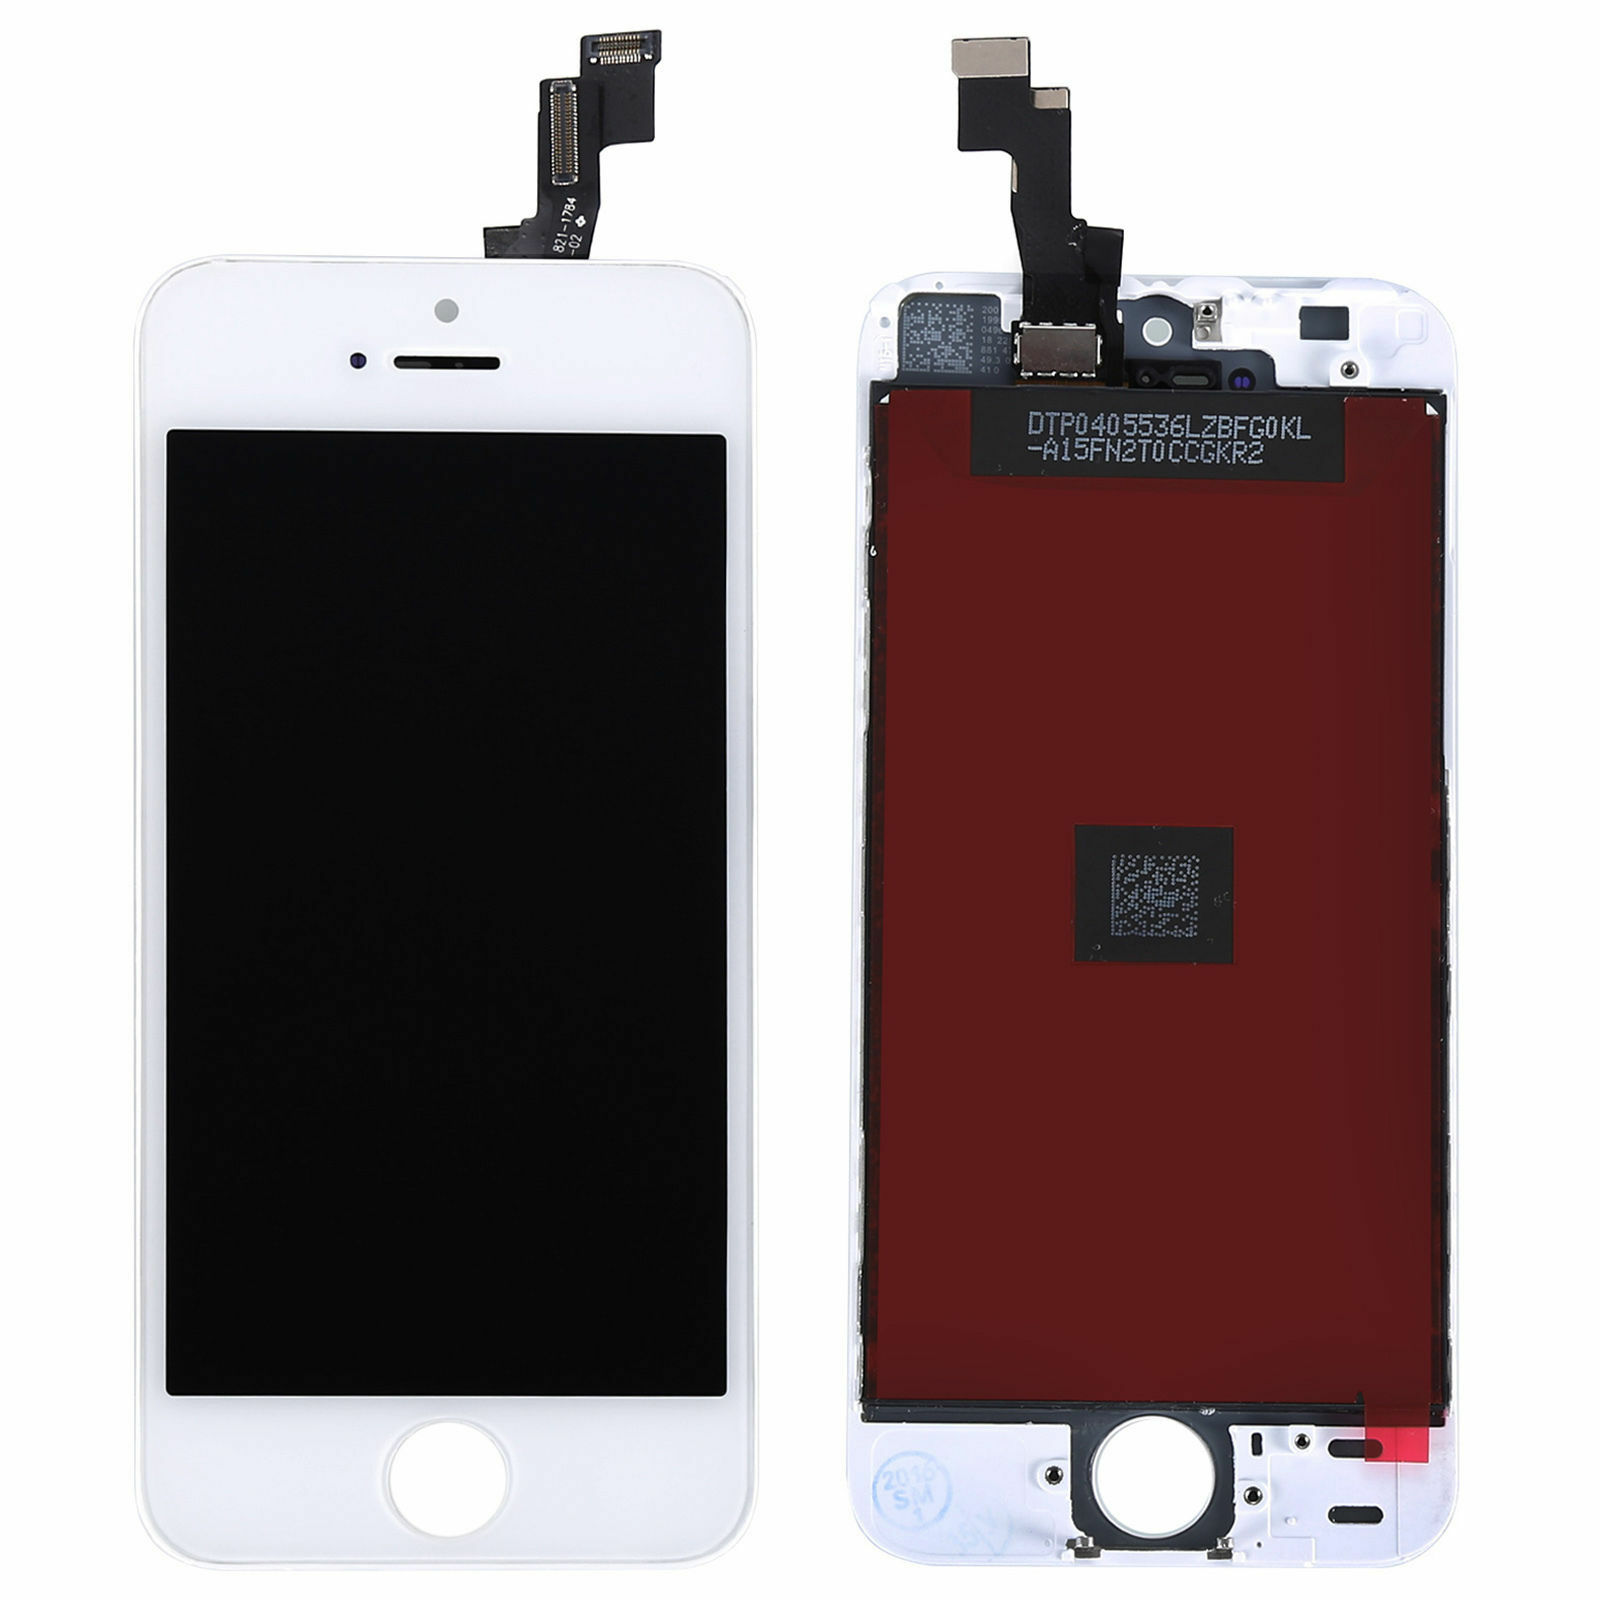 iphone 5 screen replacement tutorial